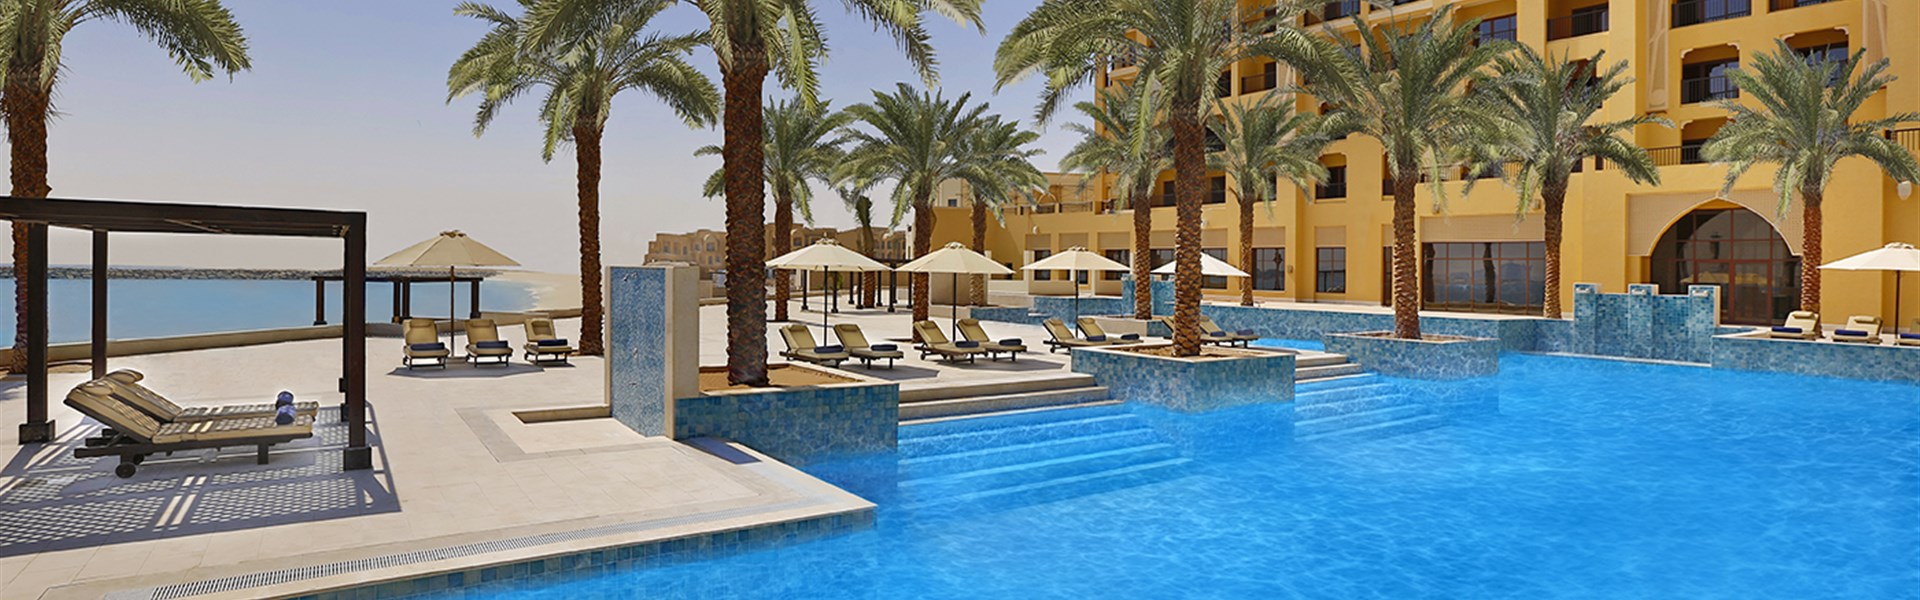 Marco Polo - DoubleTree by Hilton Resort & Spa Marjan Island Ras AL Khaimah - bazén